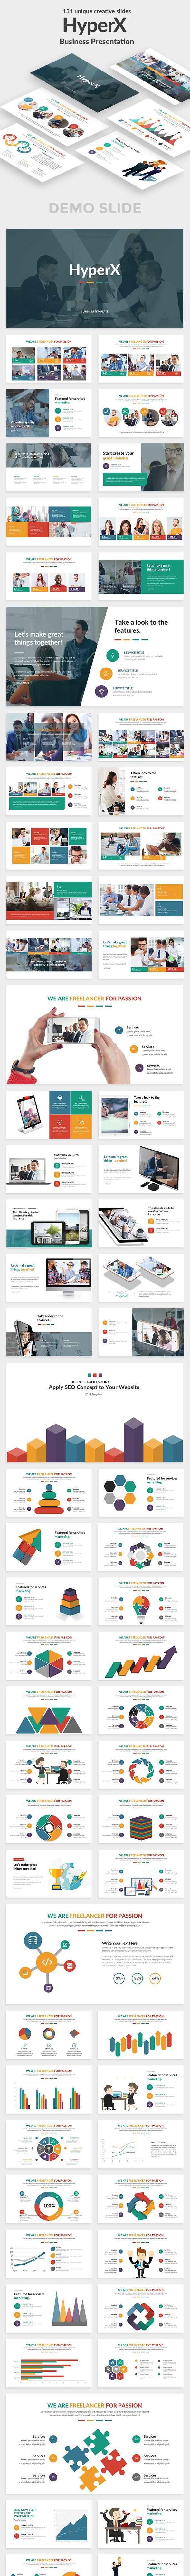 HyperX Business Powerpoint Template - Business PowerPoint Templates